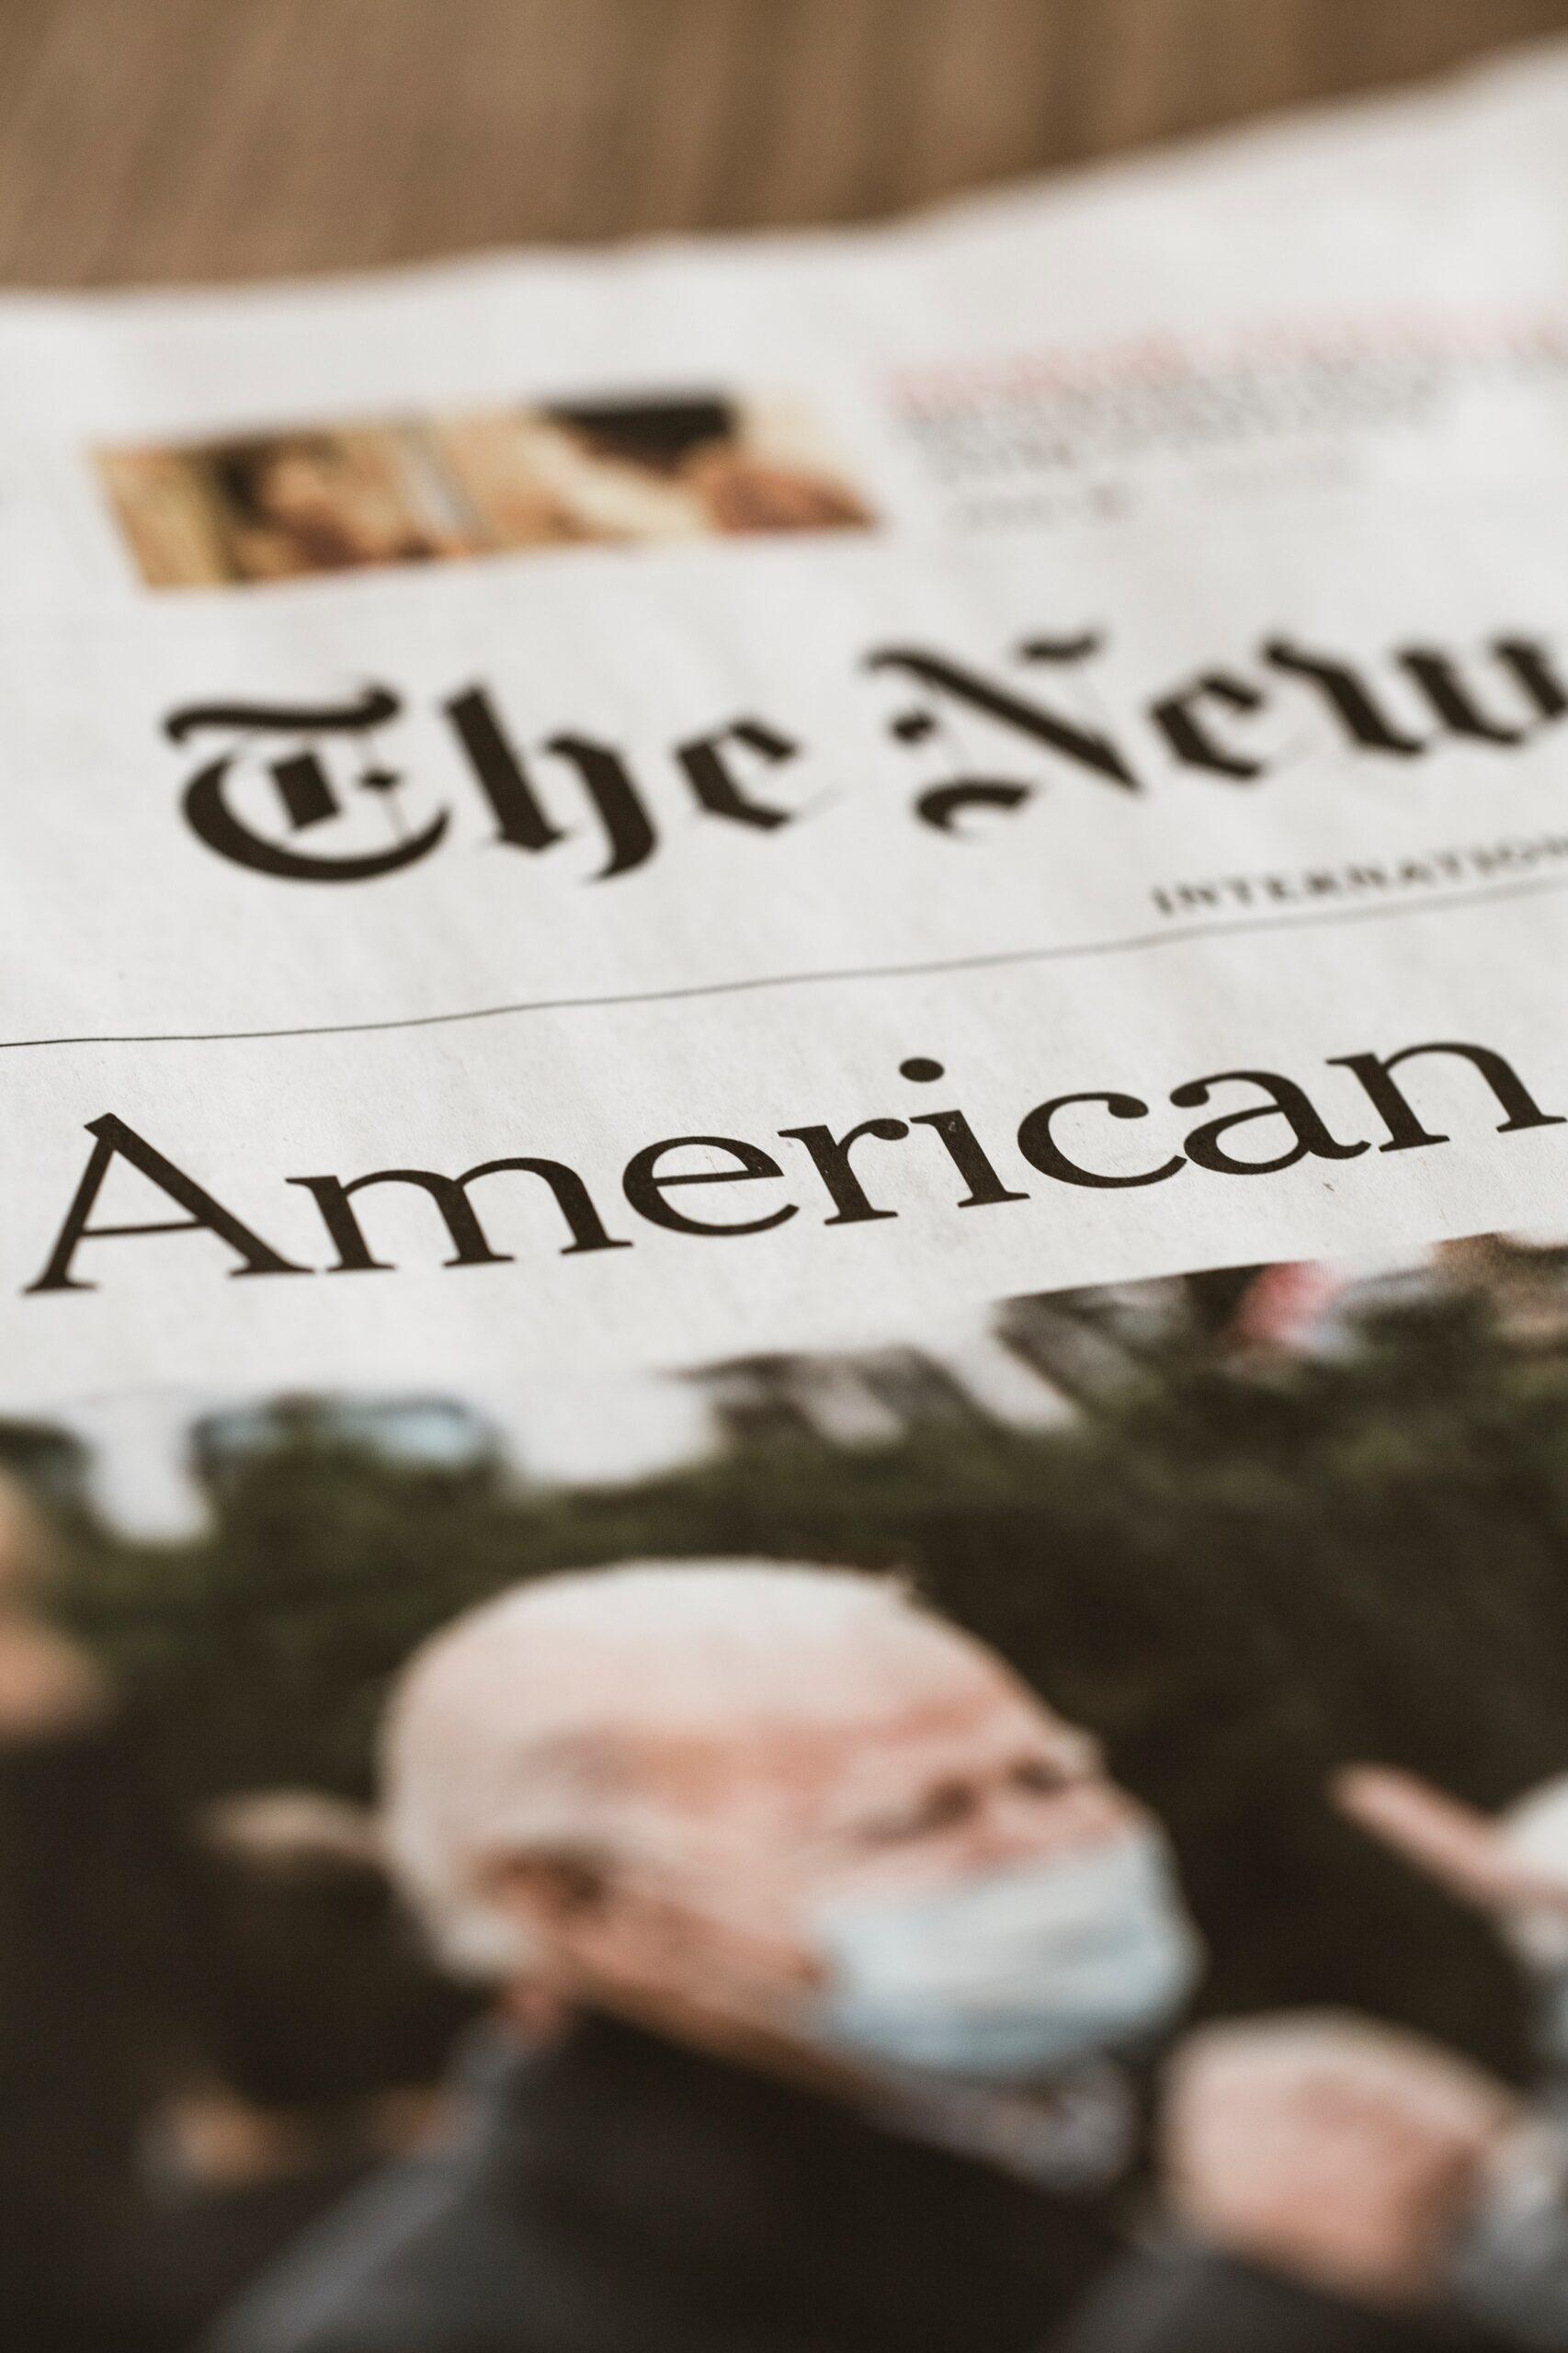 markus-spiske-New York Times newspaper up close-unsplash